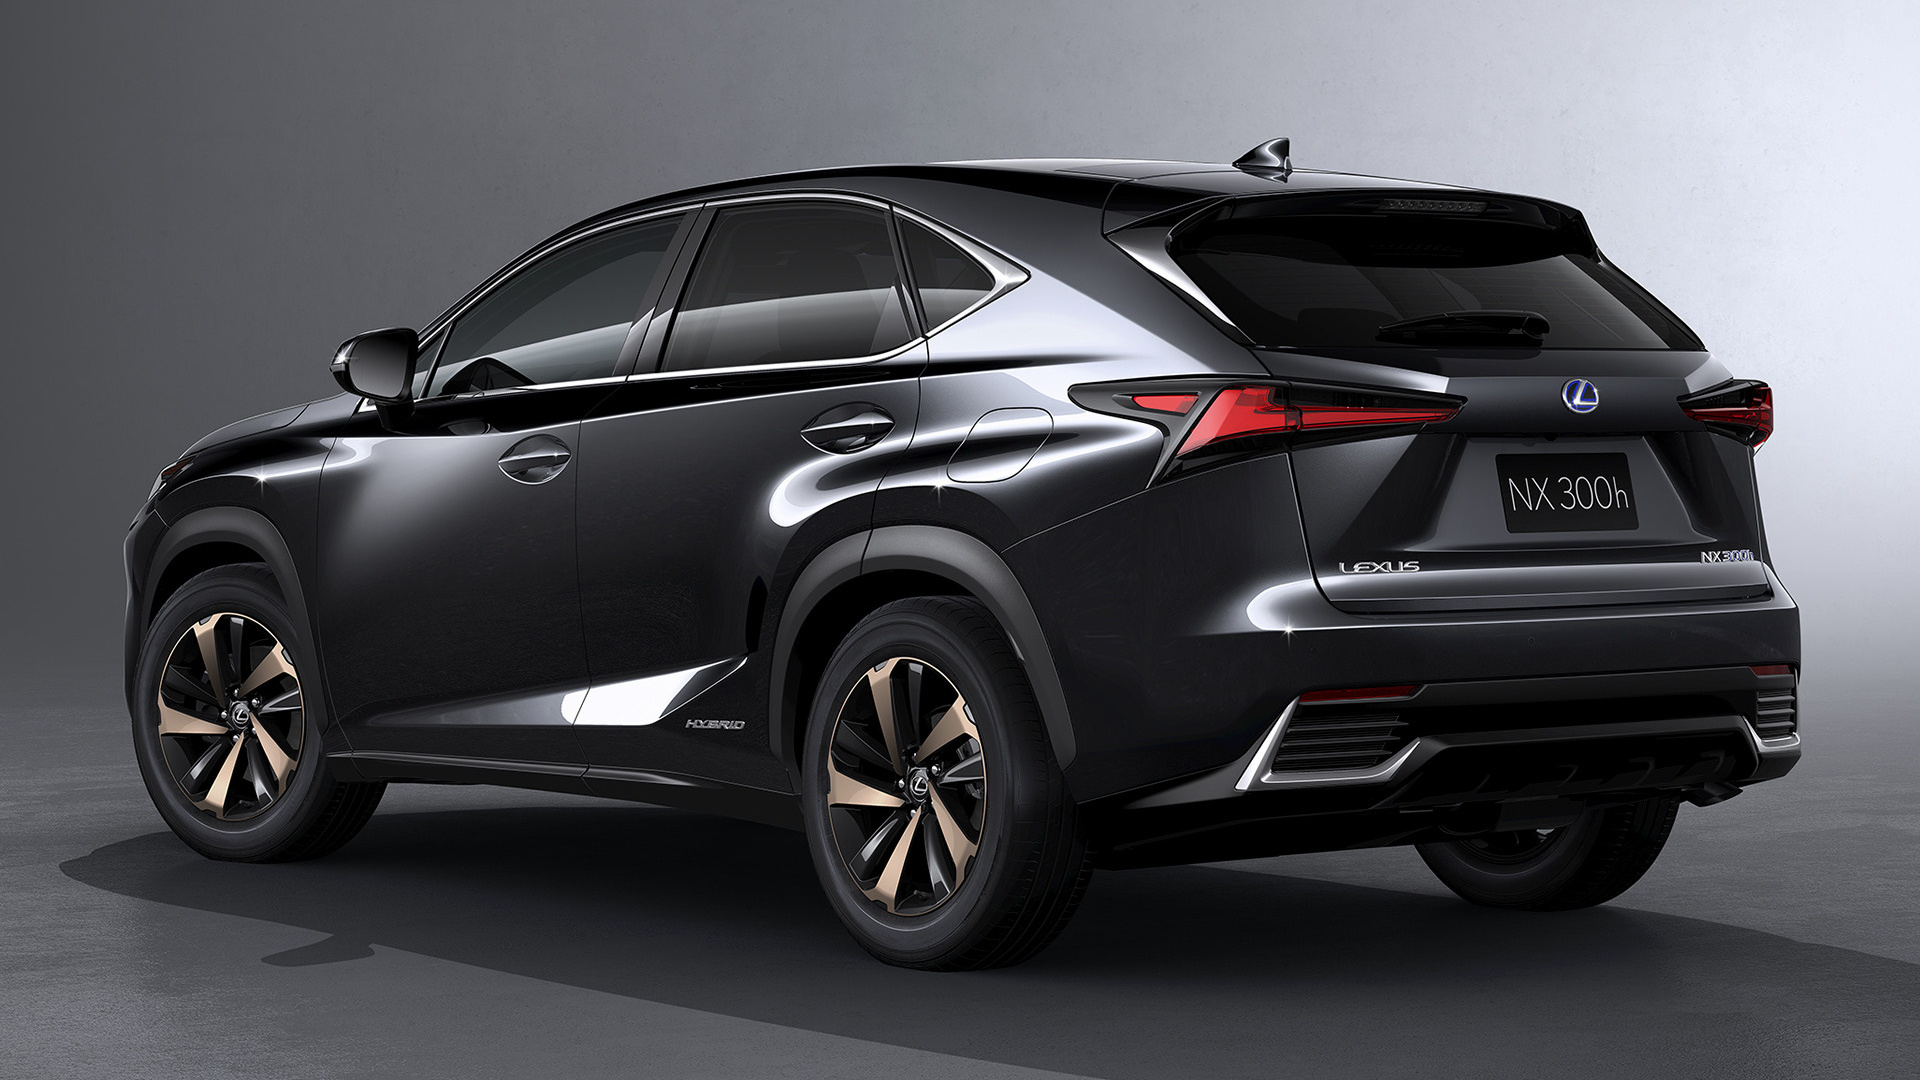 Lexus Nx Hybrid >> 2017 Lexus Nx Hybrid Wallpapers And Hd Images Car Pixel